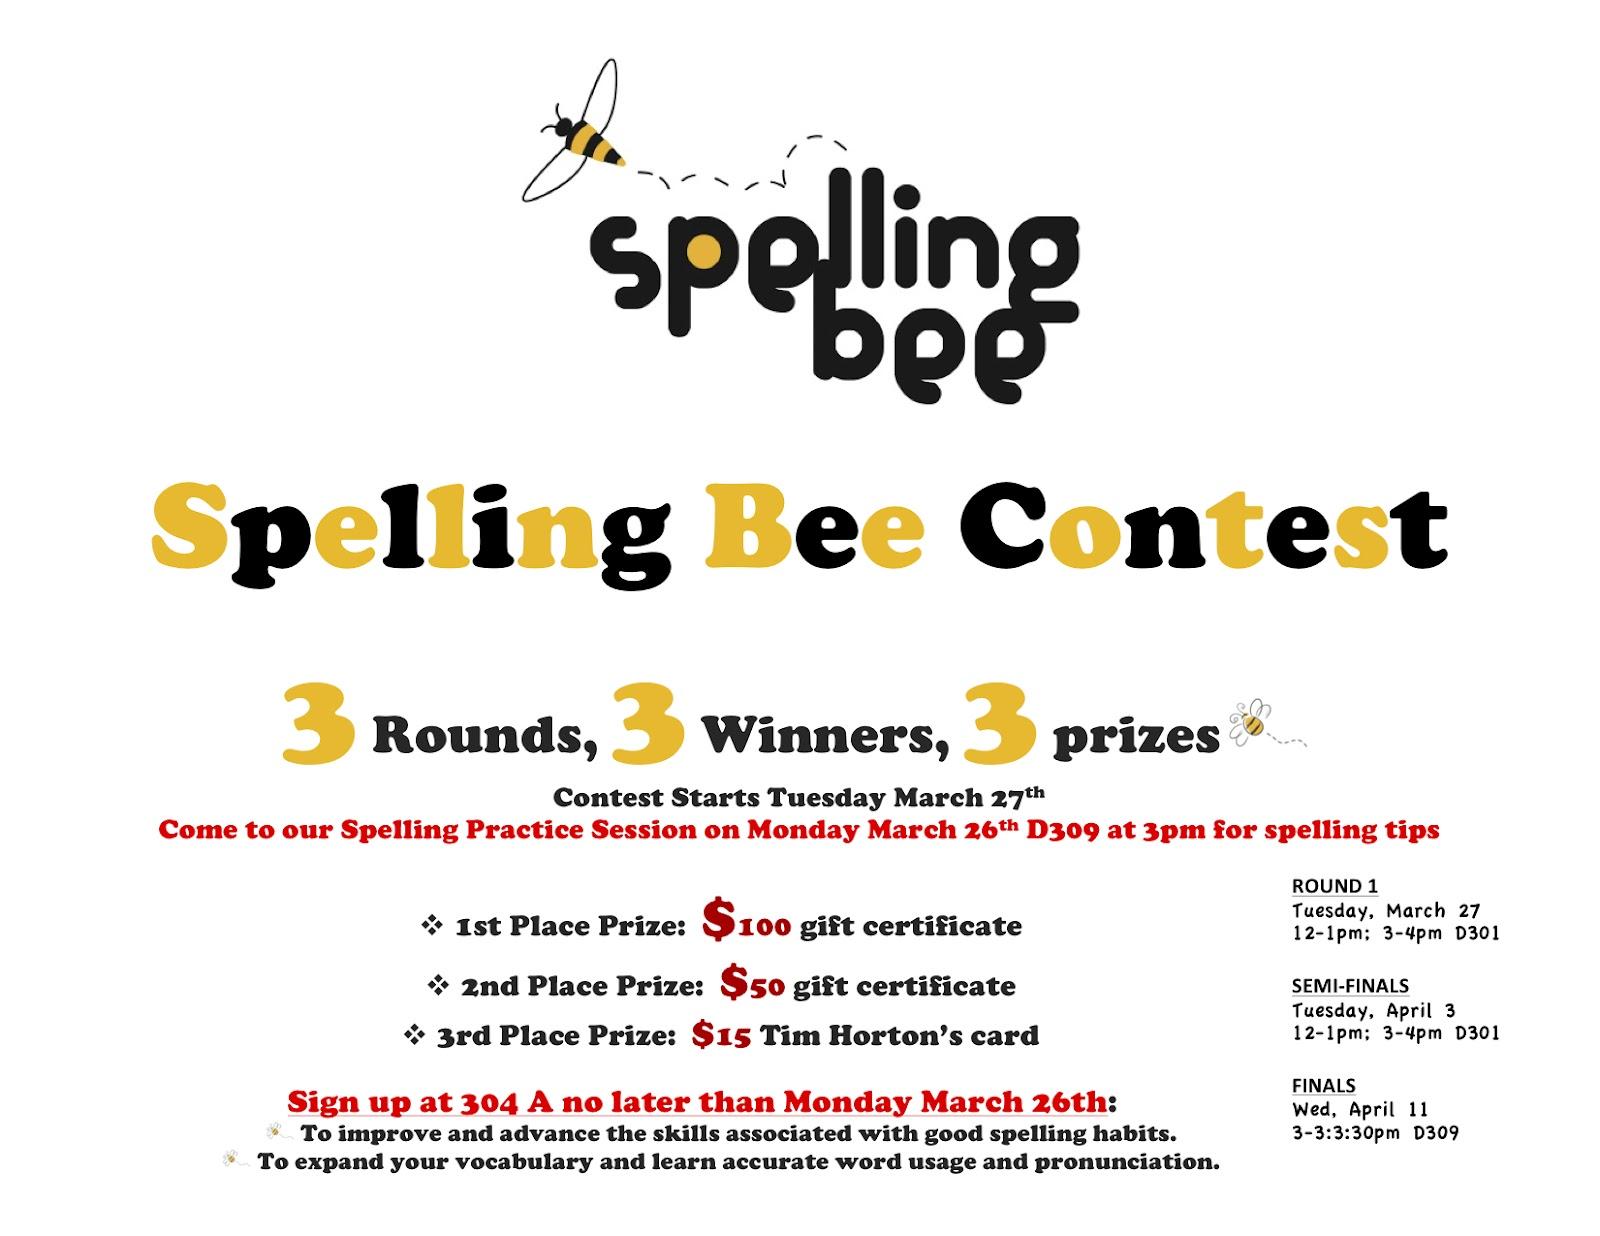 Spelling Bee Logo What's a spelling bee?